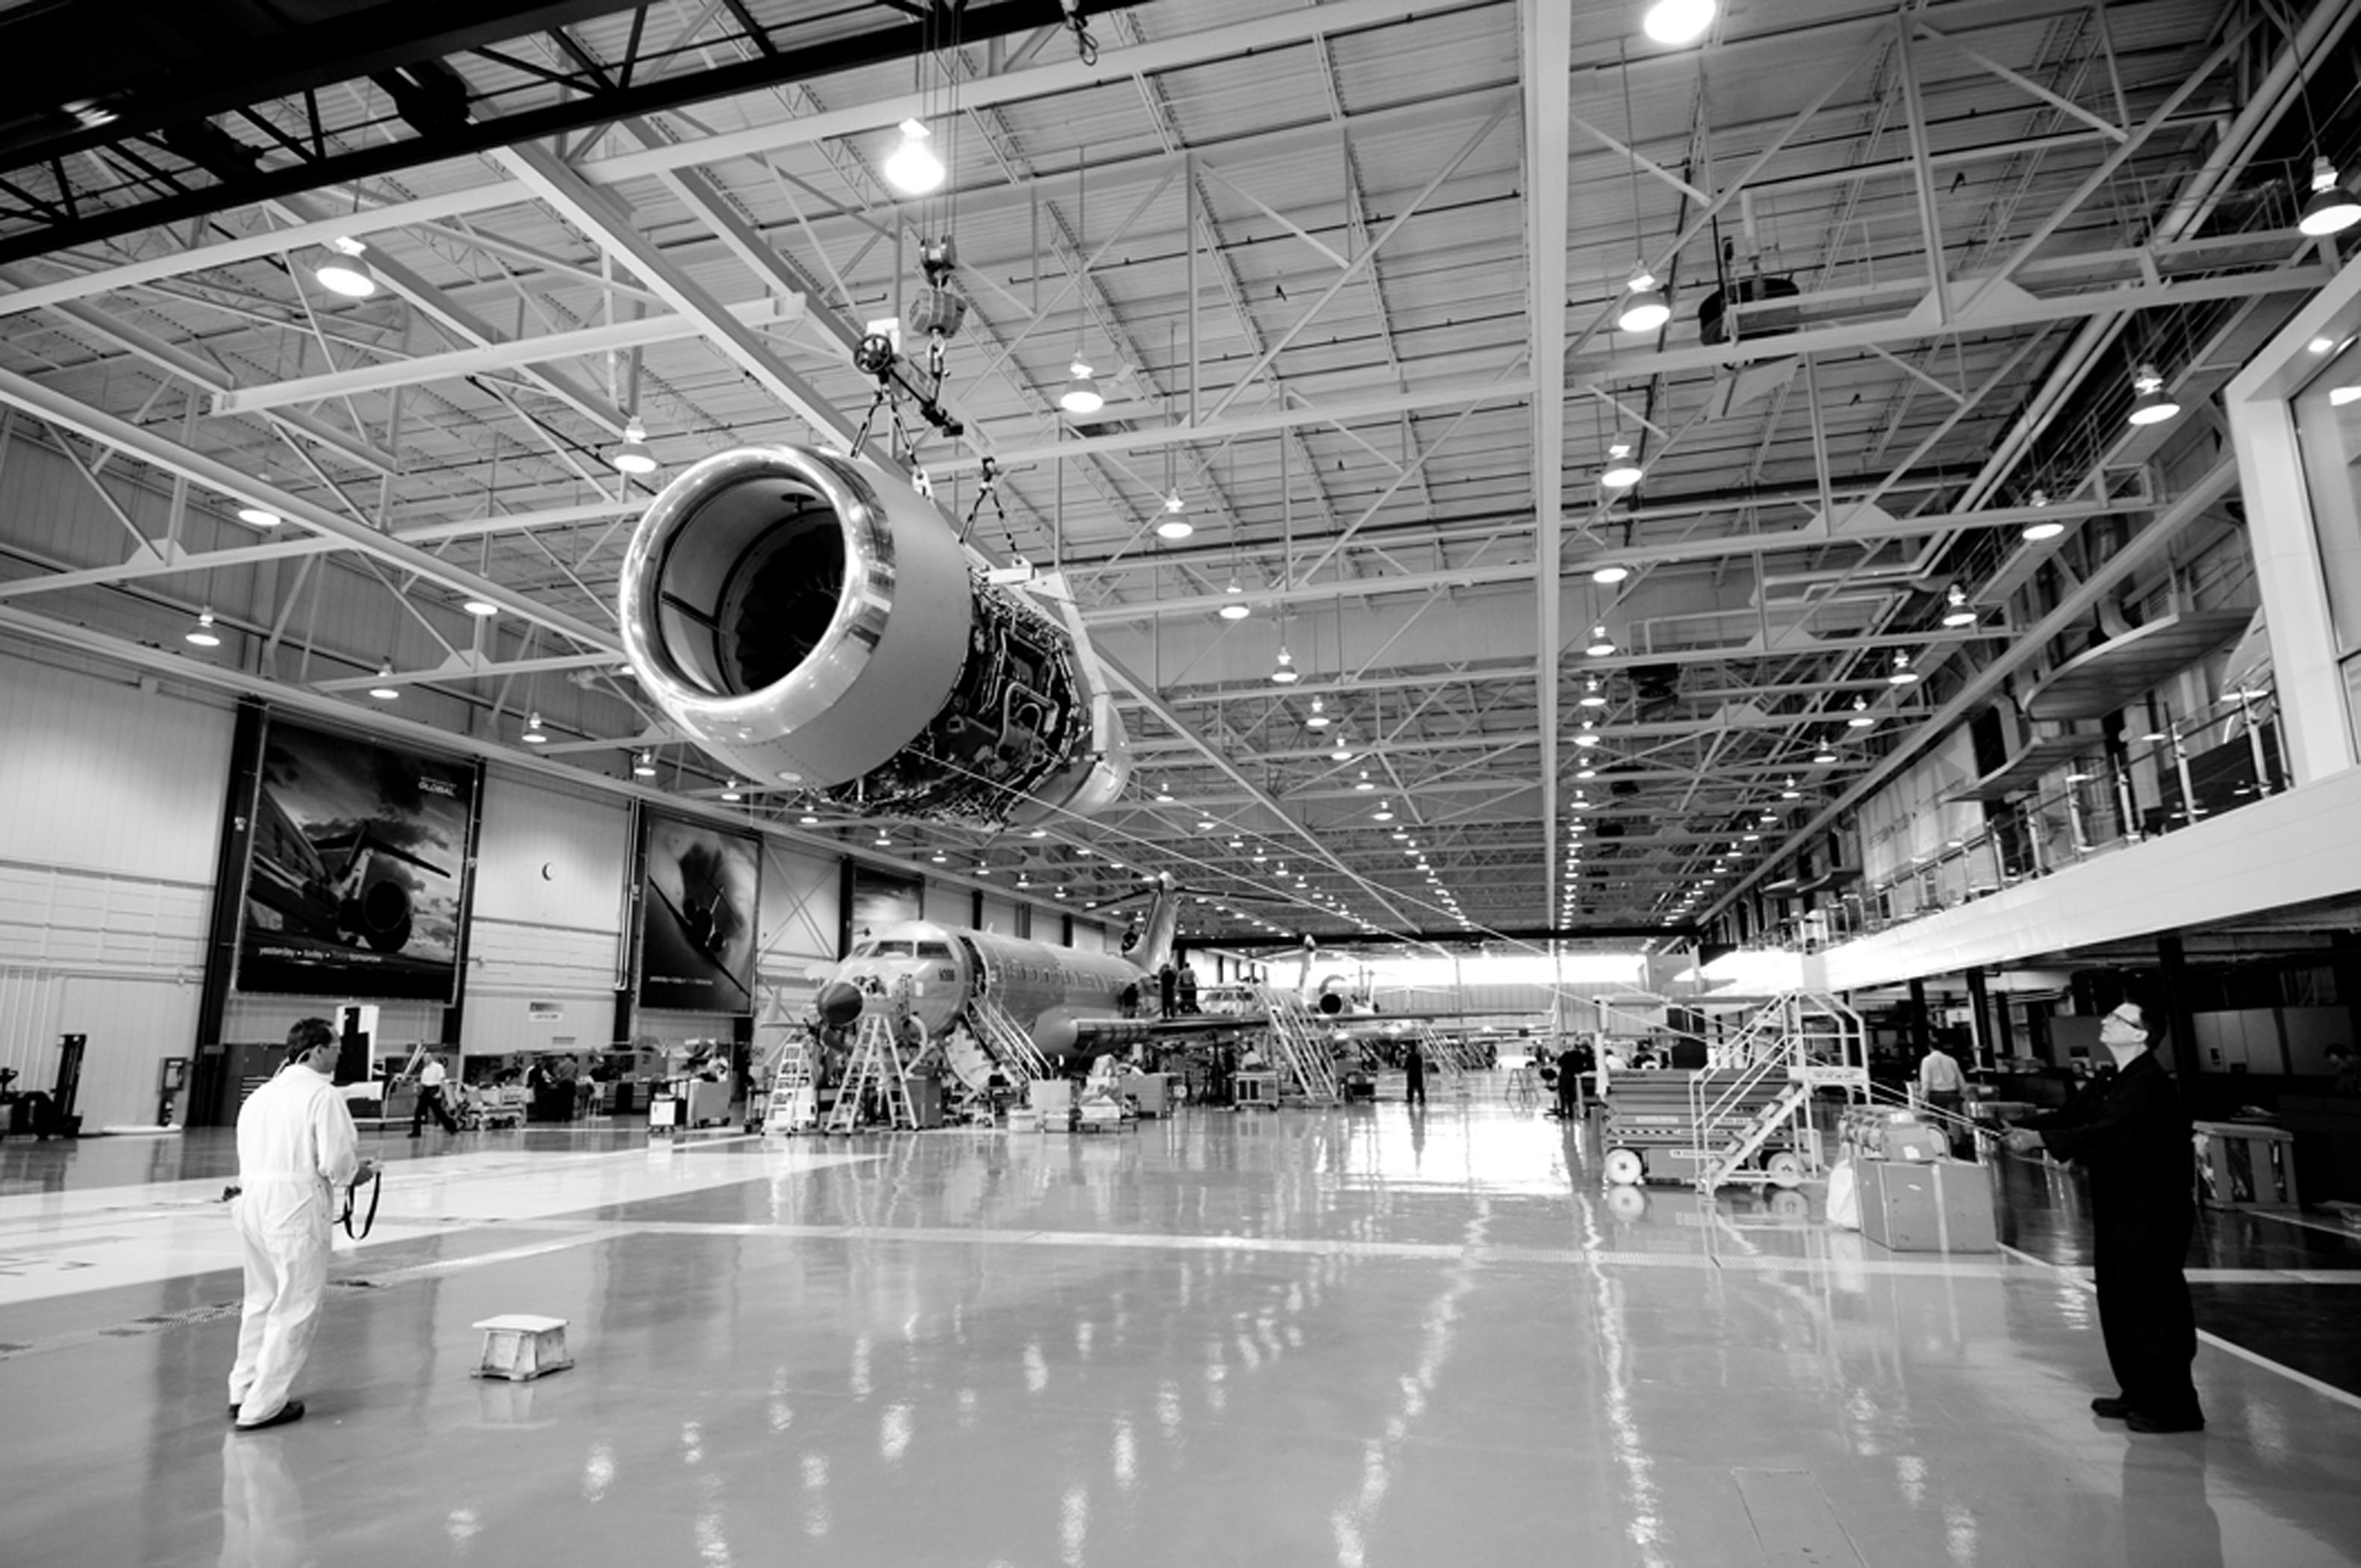 canadian aerospace companys woes - HD3162×2100